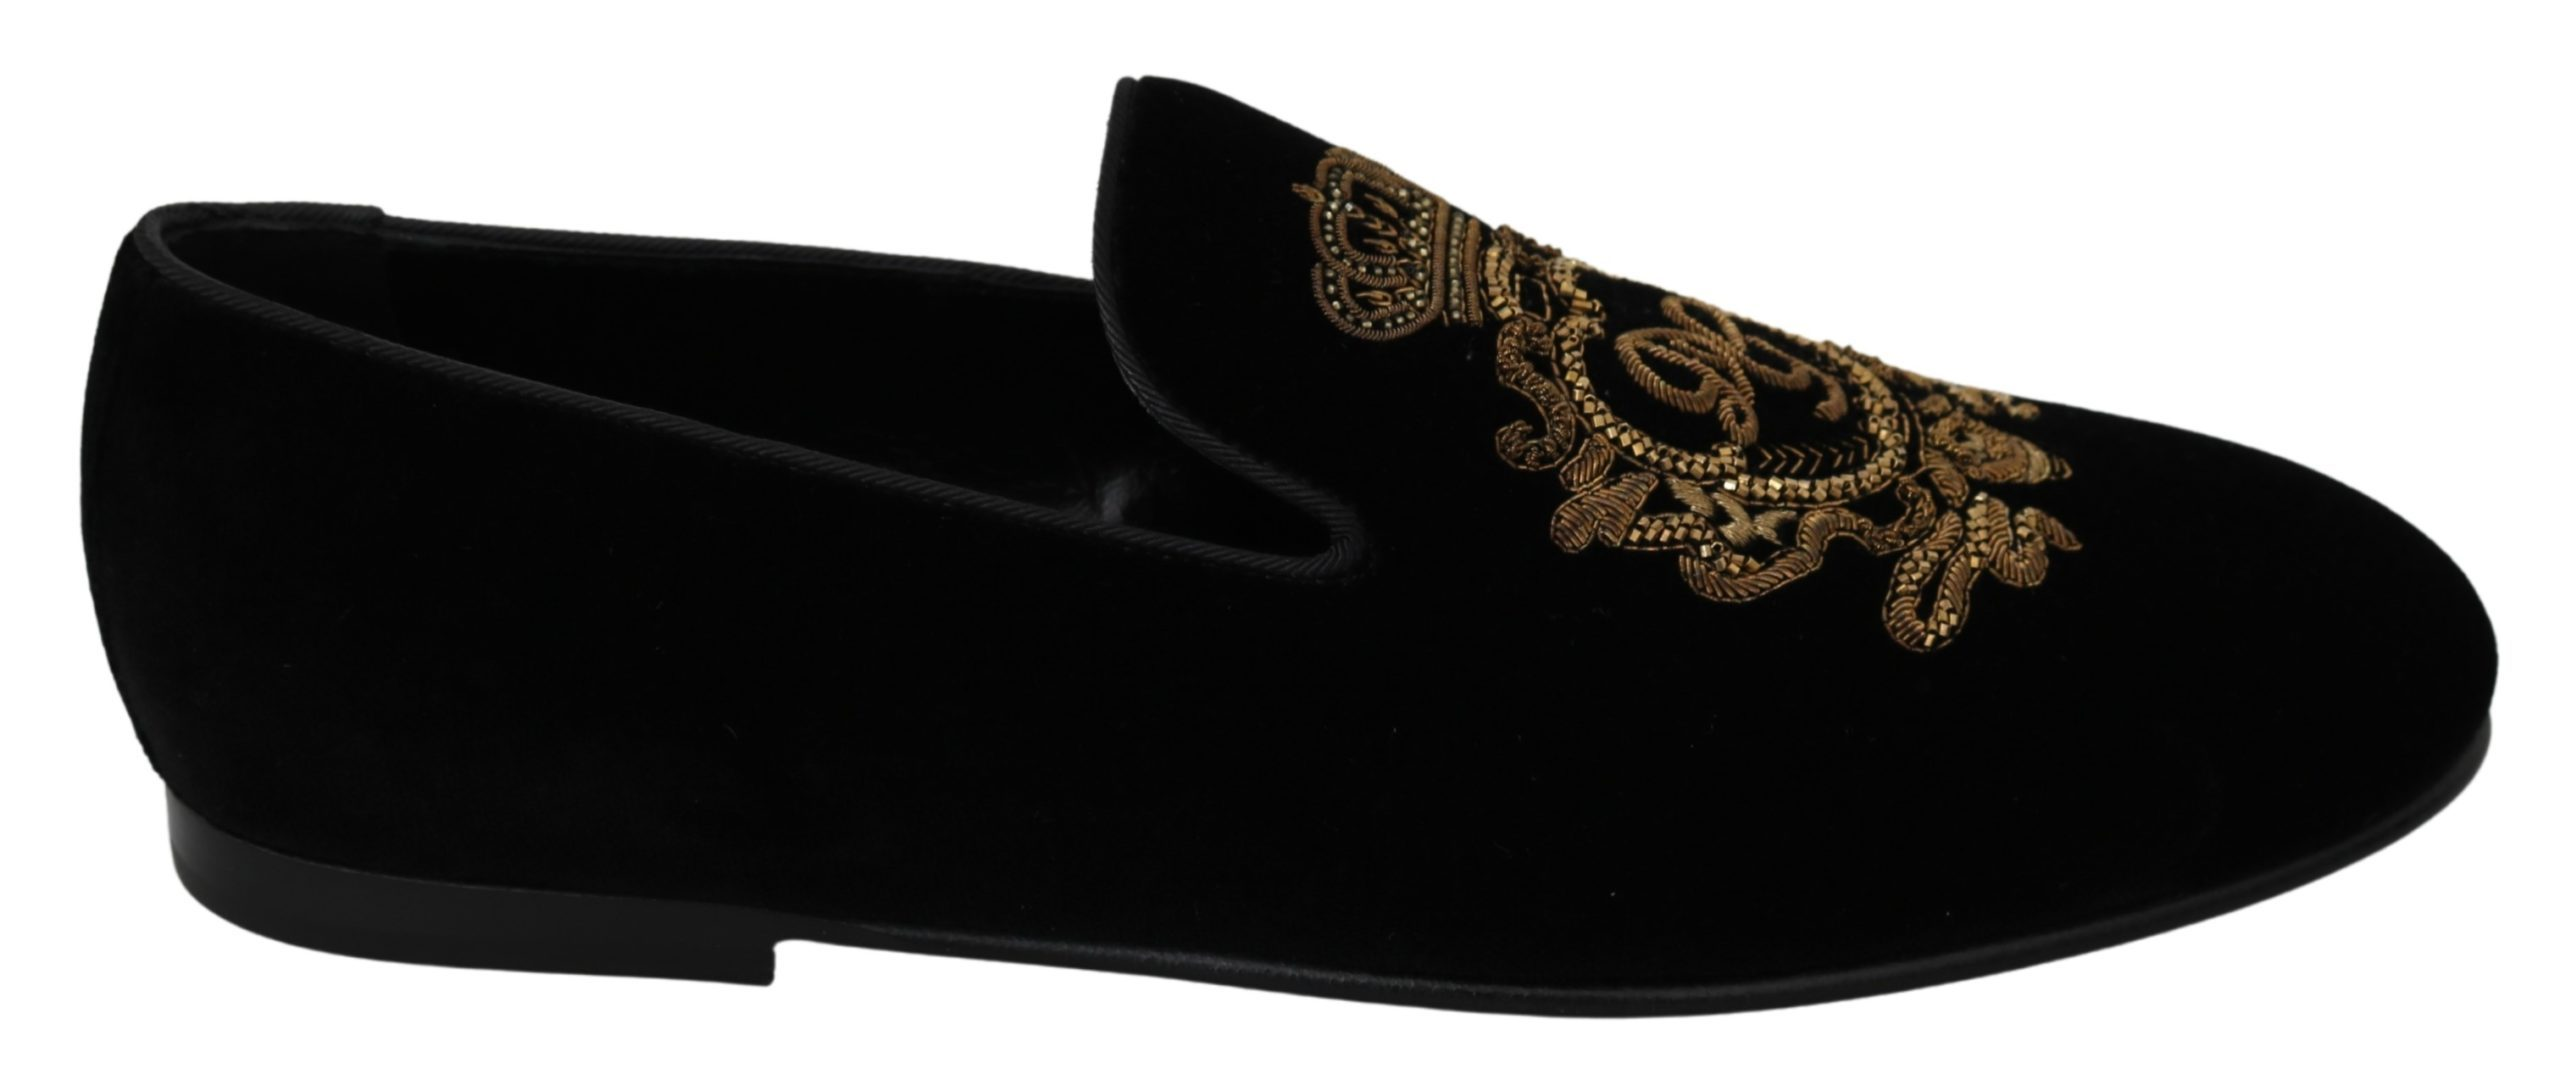 Dolce & Gabbana Men's Logo Loafers Black MV2862 - EU41.5/US8.5